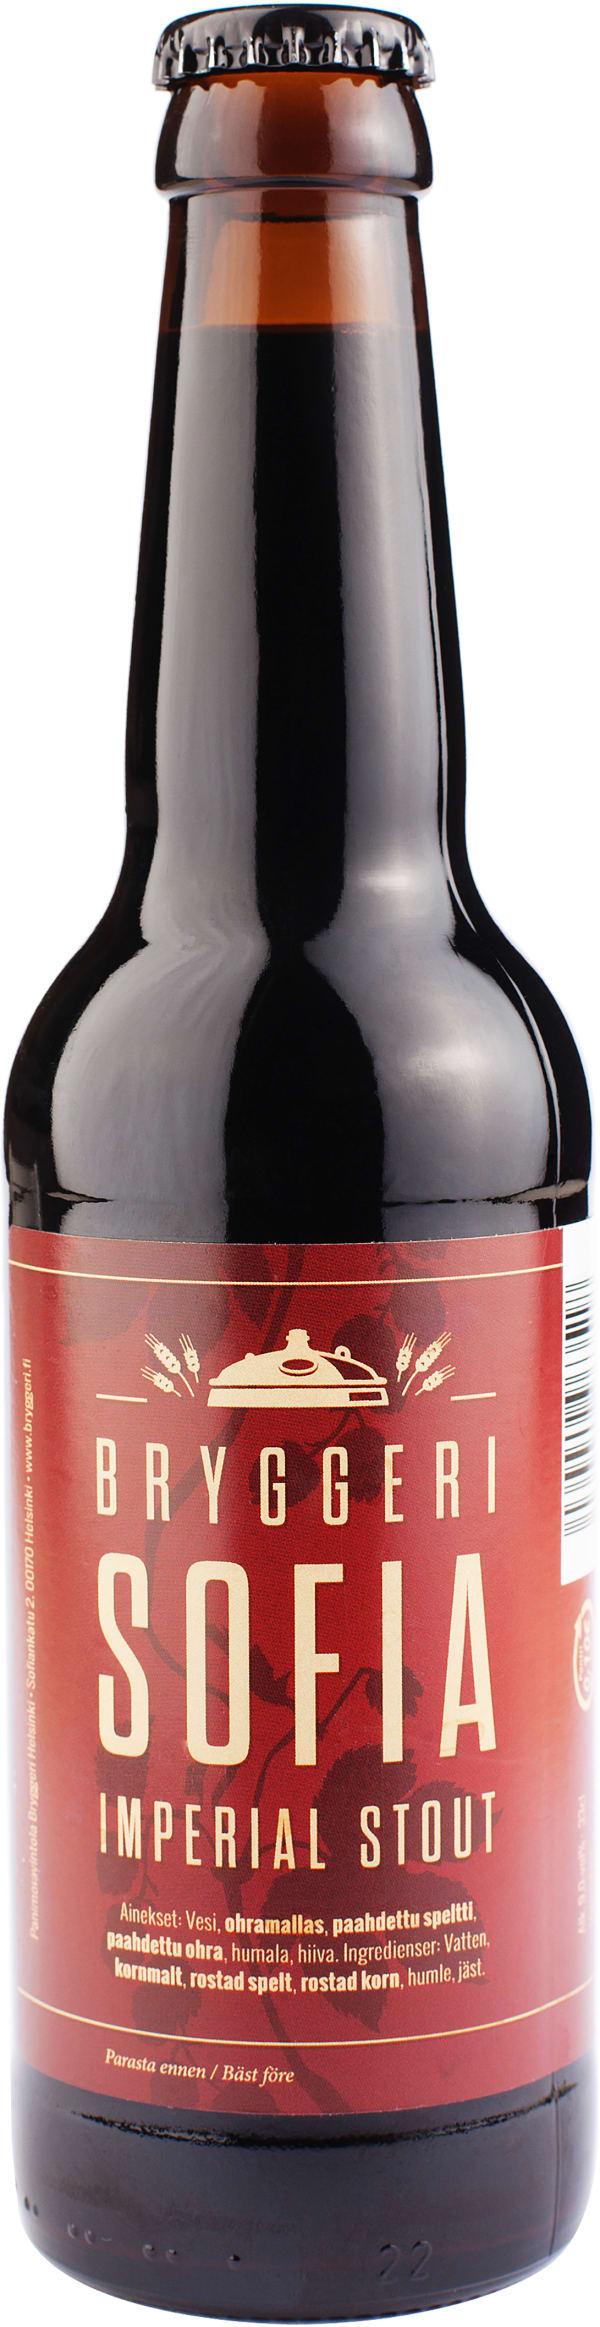 Bryggeri Sofia Imperial Stout